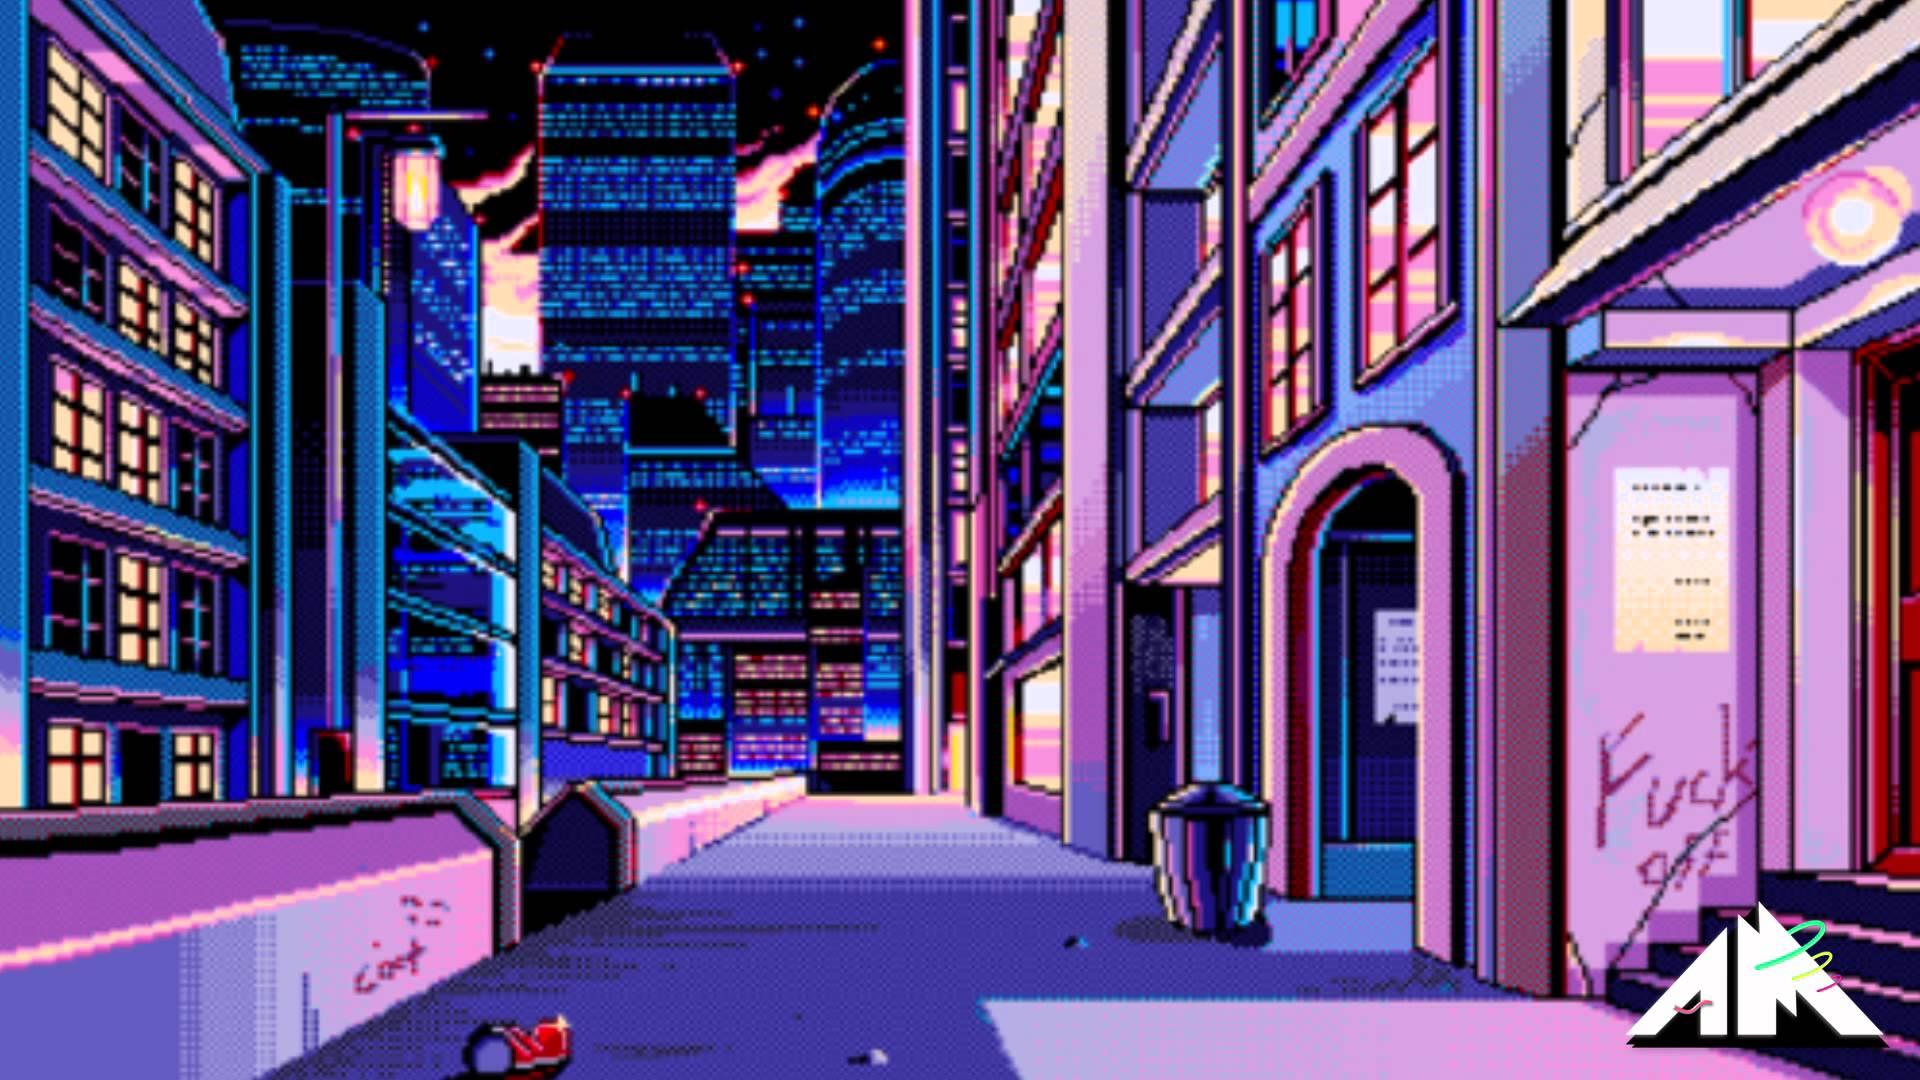 Aesthetic Vaporwave City Wallpapers On Wallpaperdog